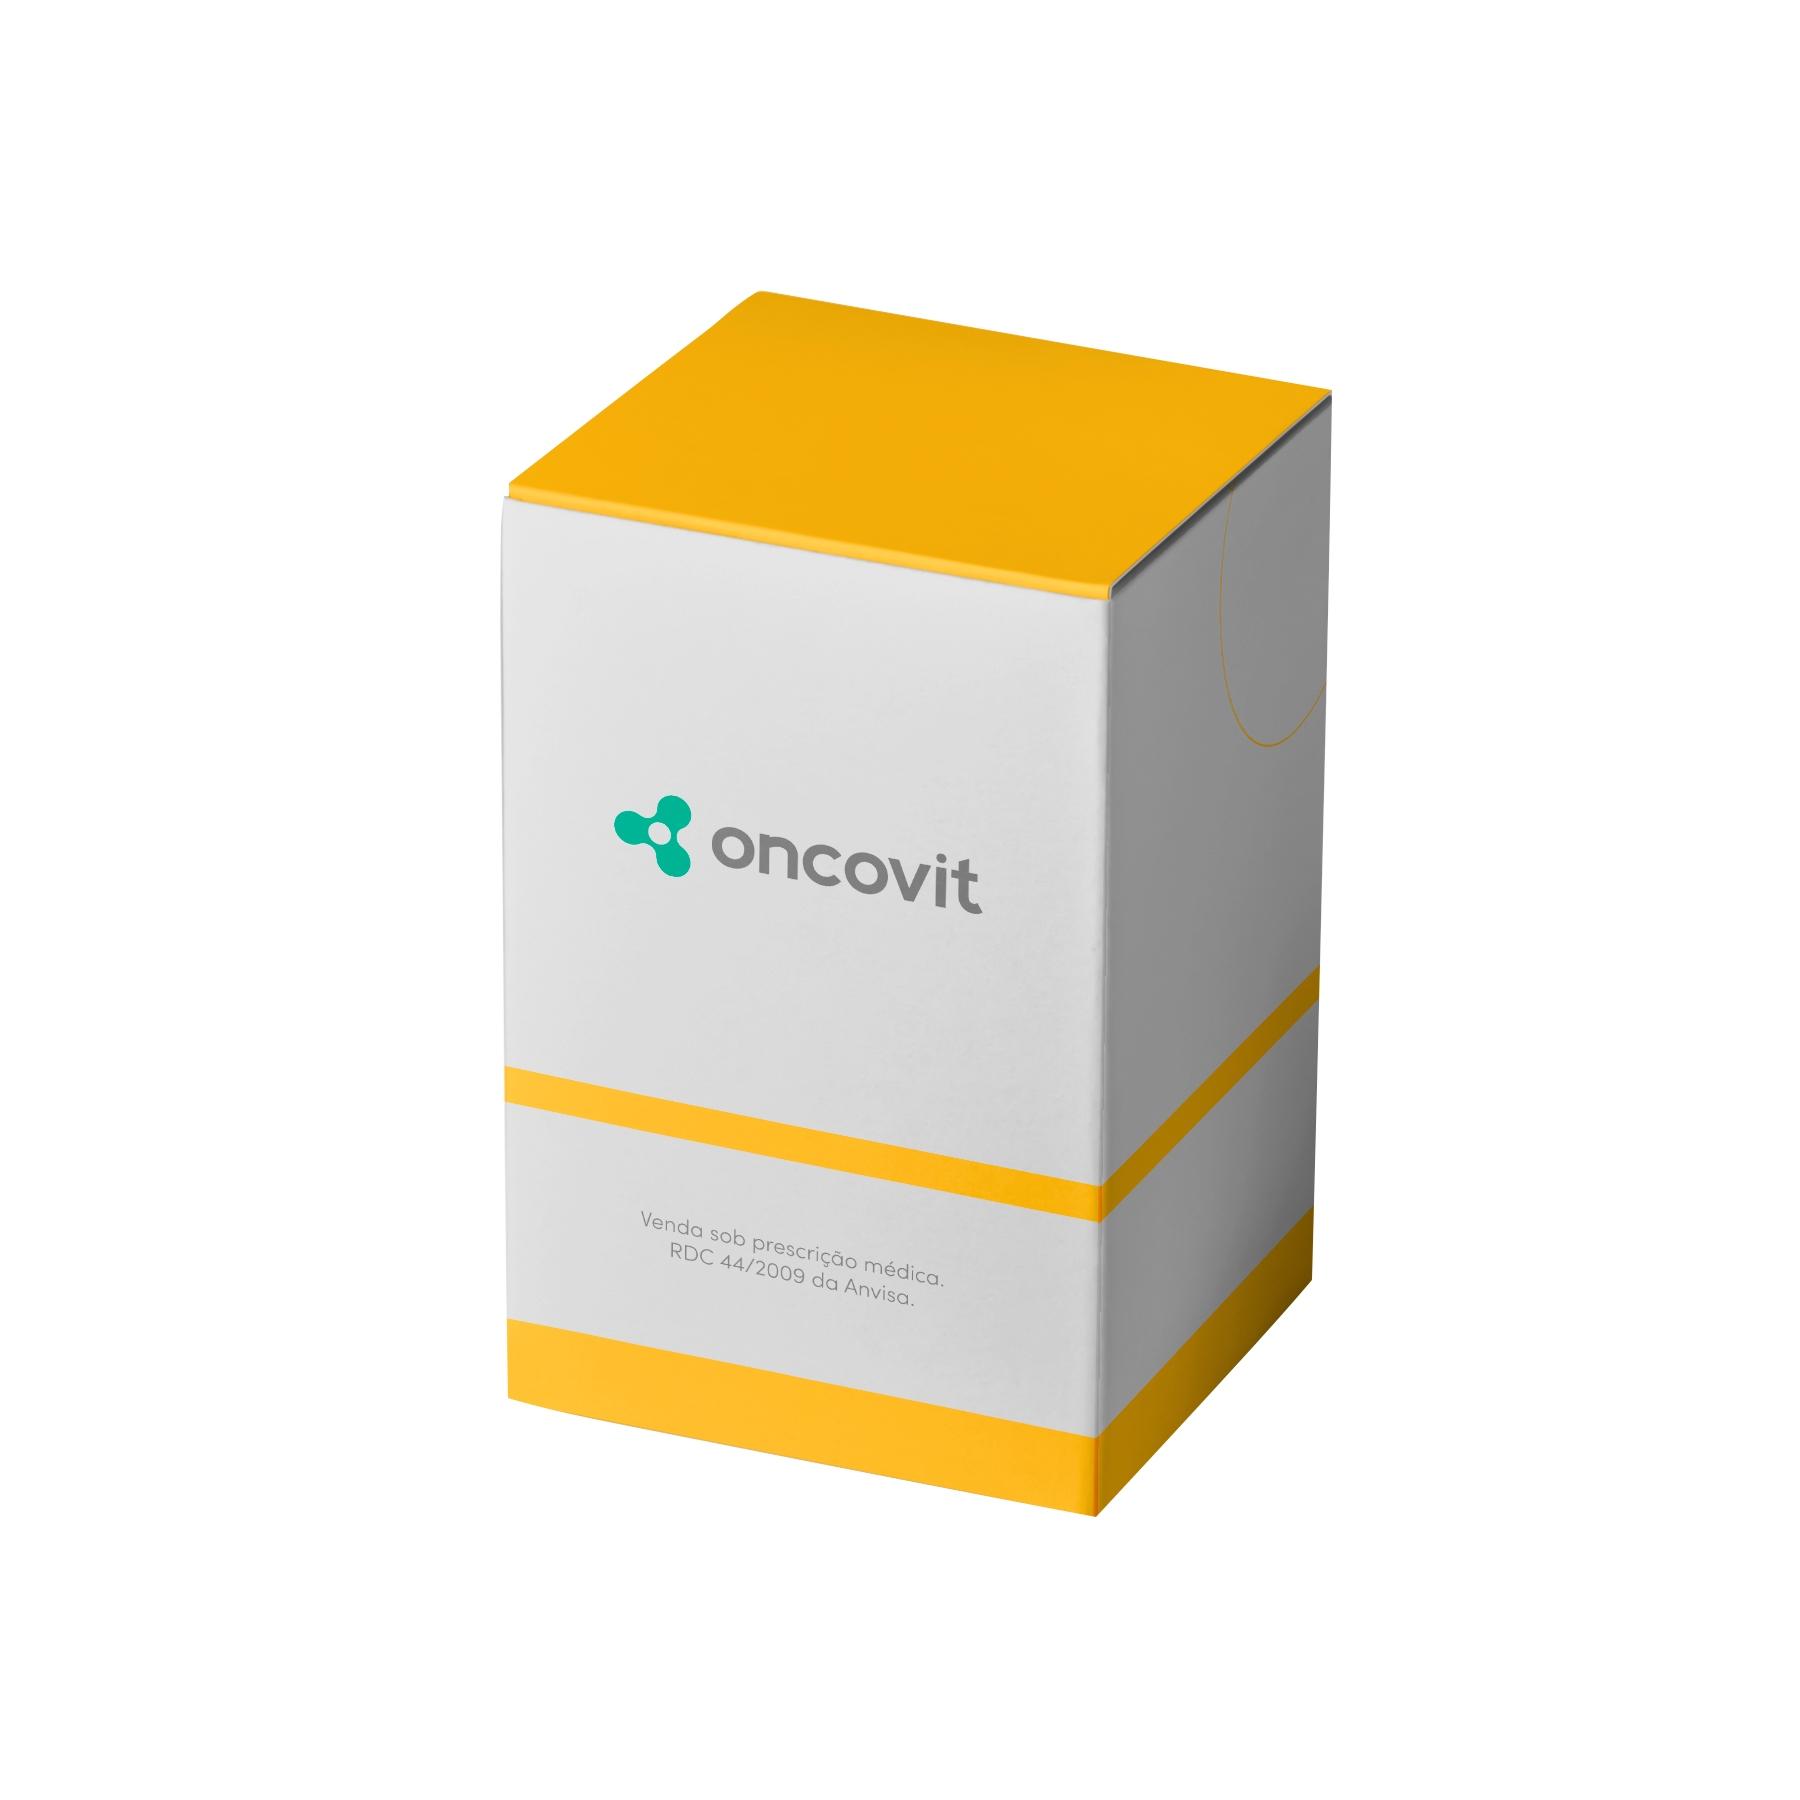 Xarelto 15mg caixa com 28 comprimidos revestidos